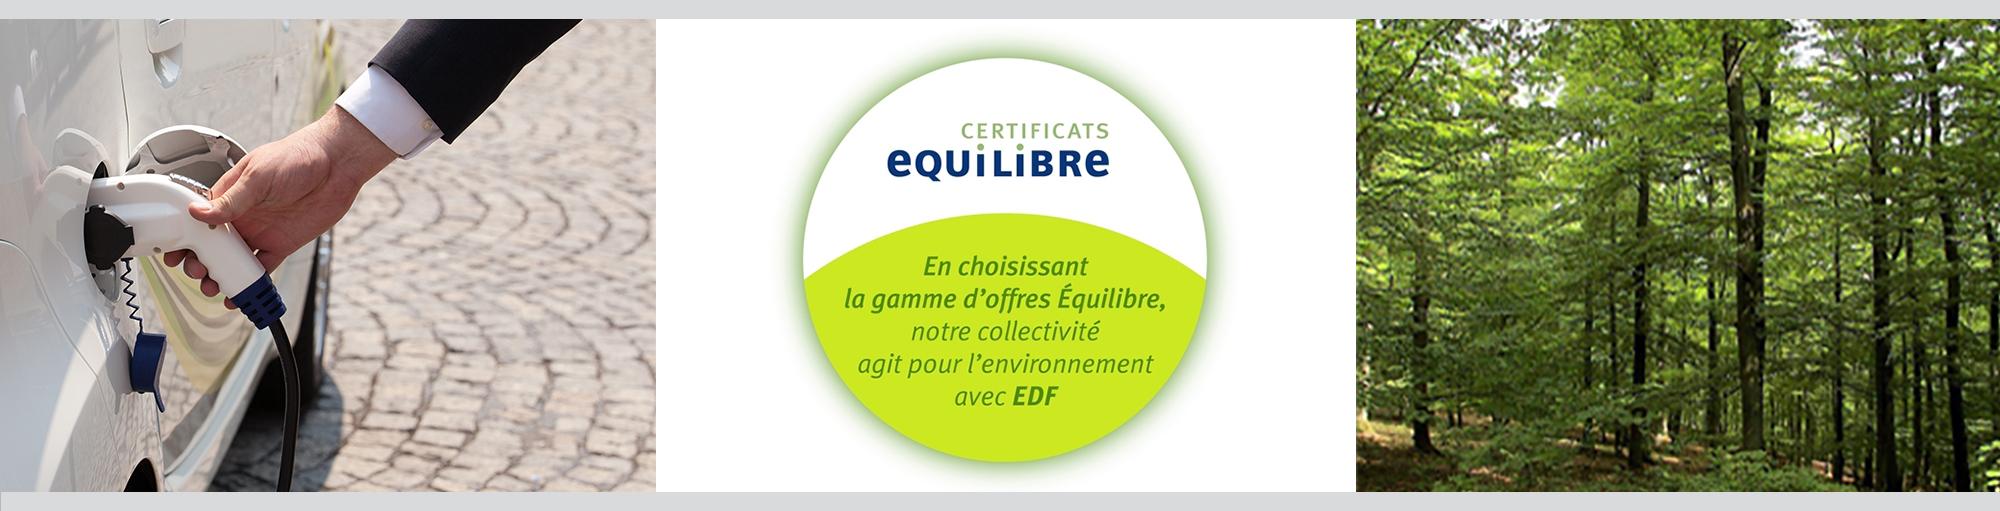 banniere-charte-eco-GIE